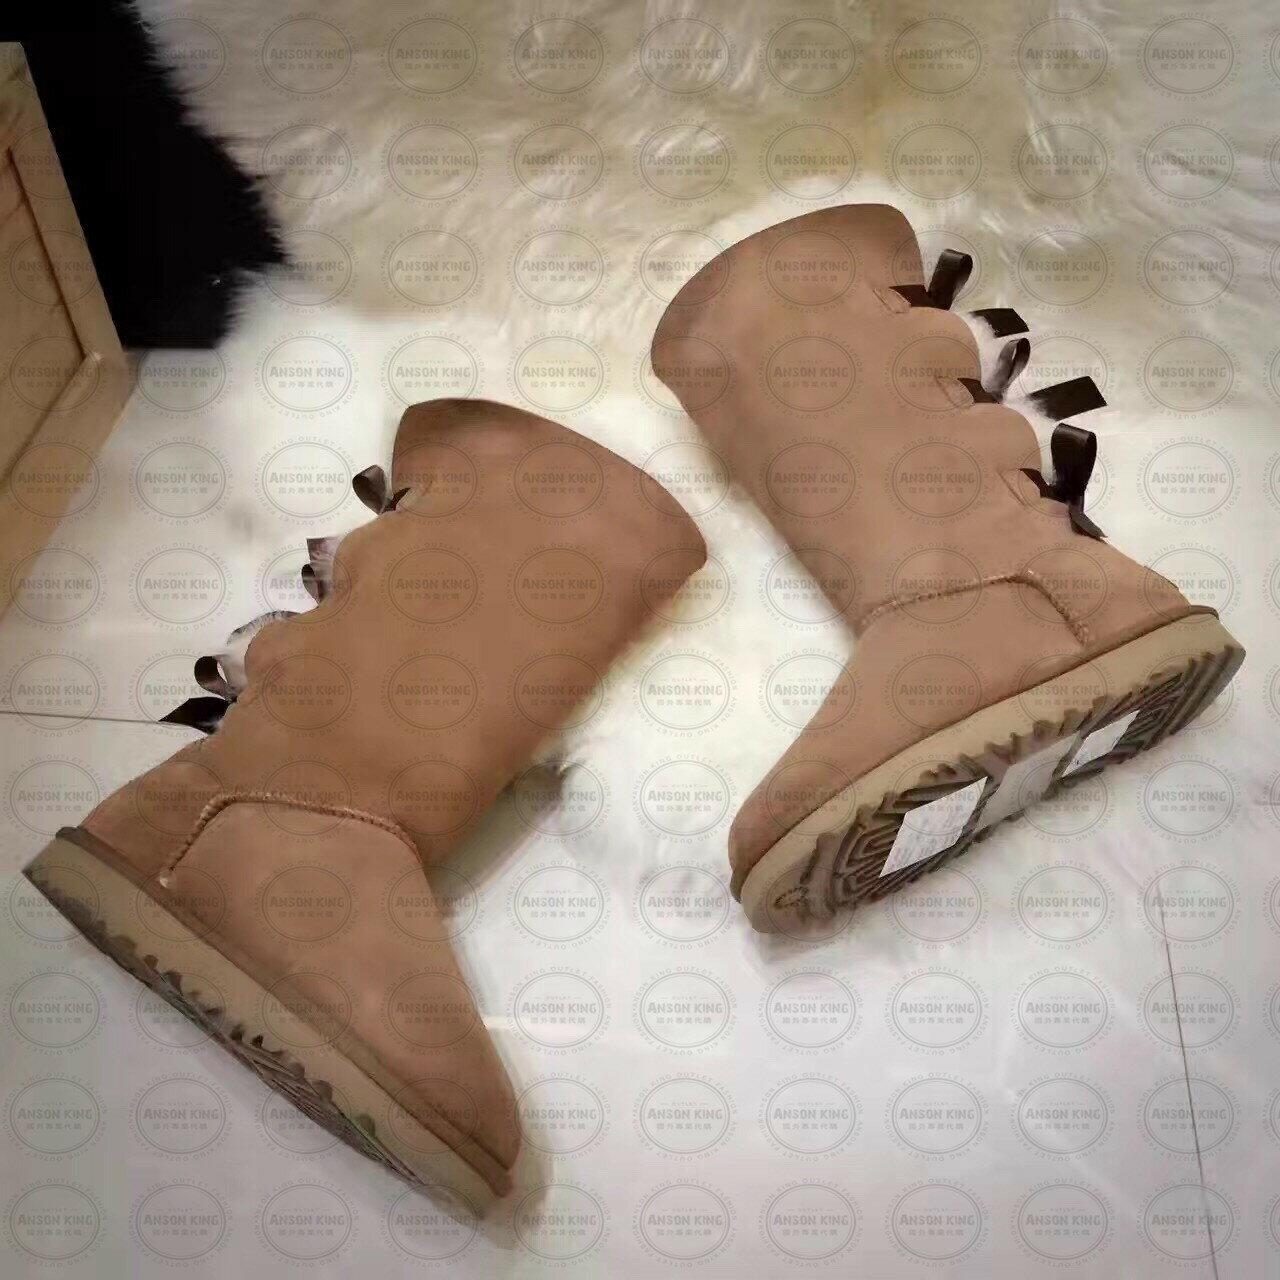 OUTLET正品代購 澳洲 UGG 一體女式絲帶蝴蝶結 保暖 真皮羊皮毛 雪靴 短靴 棕色 2